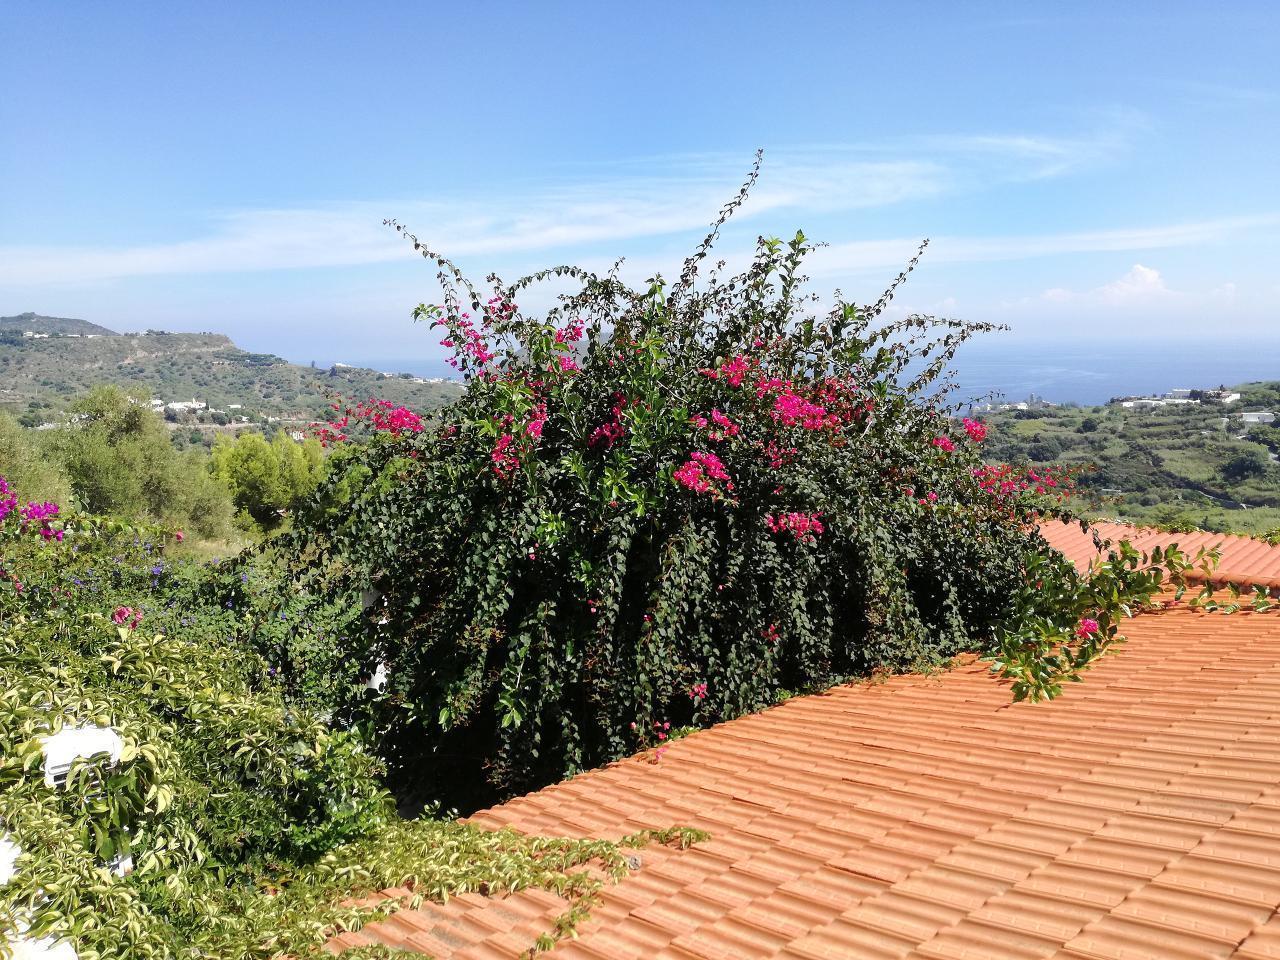 Maison de vacances Ferienhaushälfte Oleandro auf sizilianischer Insel mit atemberaubenden Meeres-Rundblick (2045159), Lipari, Lipari, Sicile, Italie, image 50